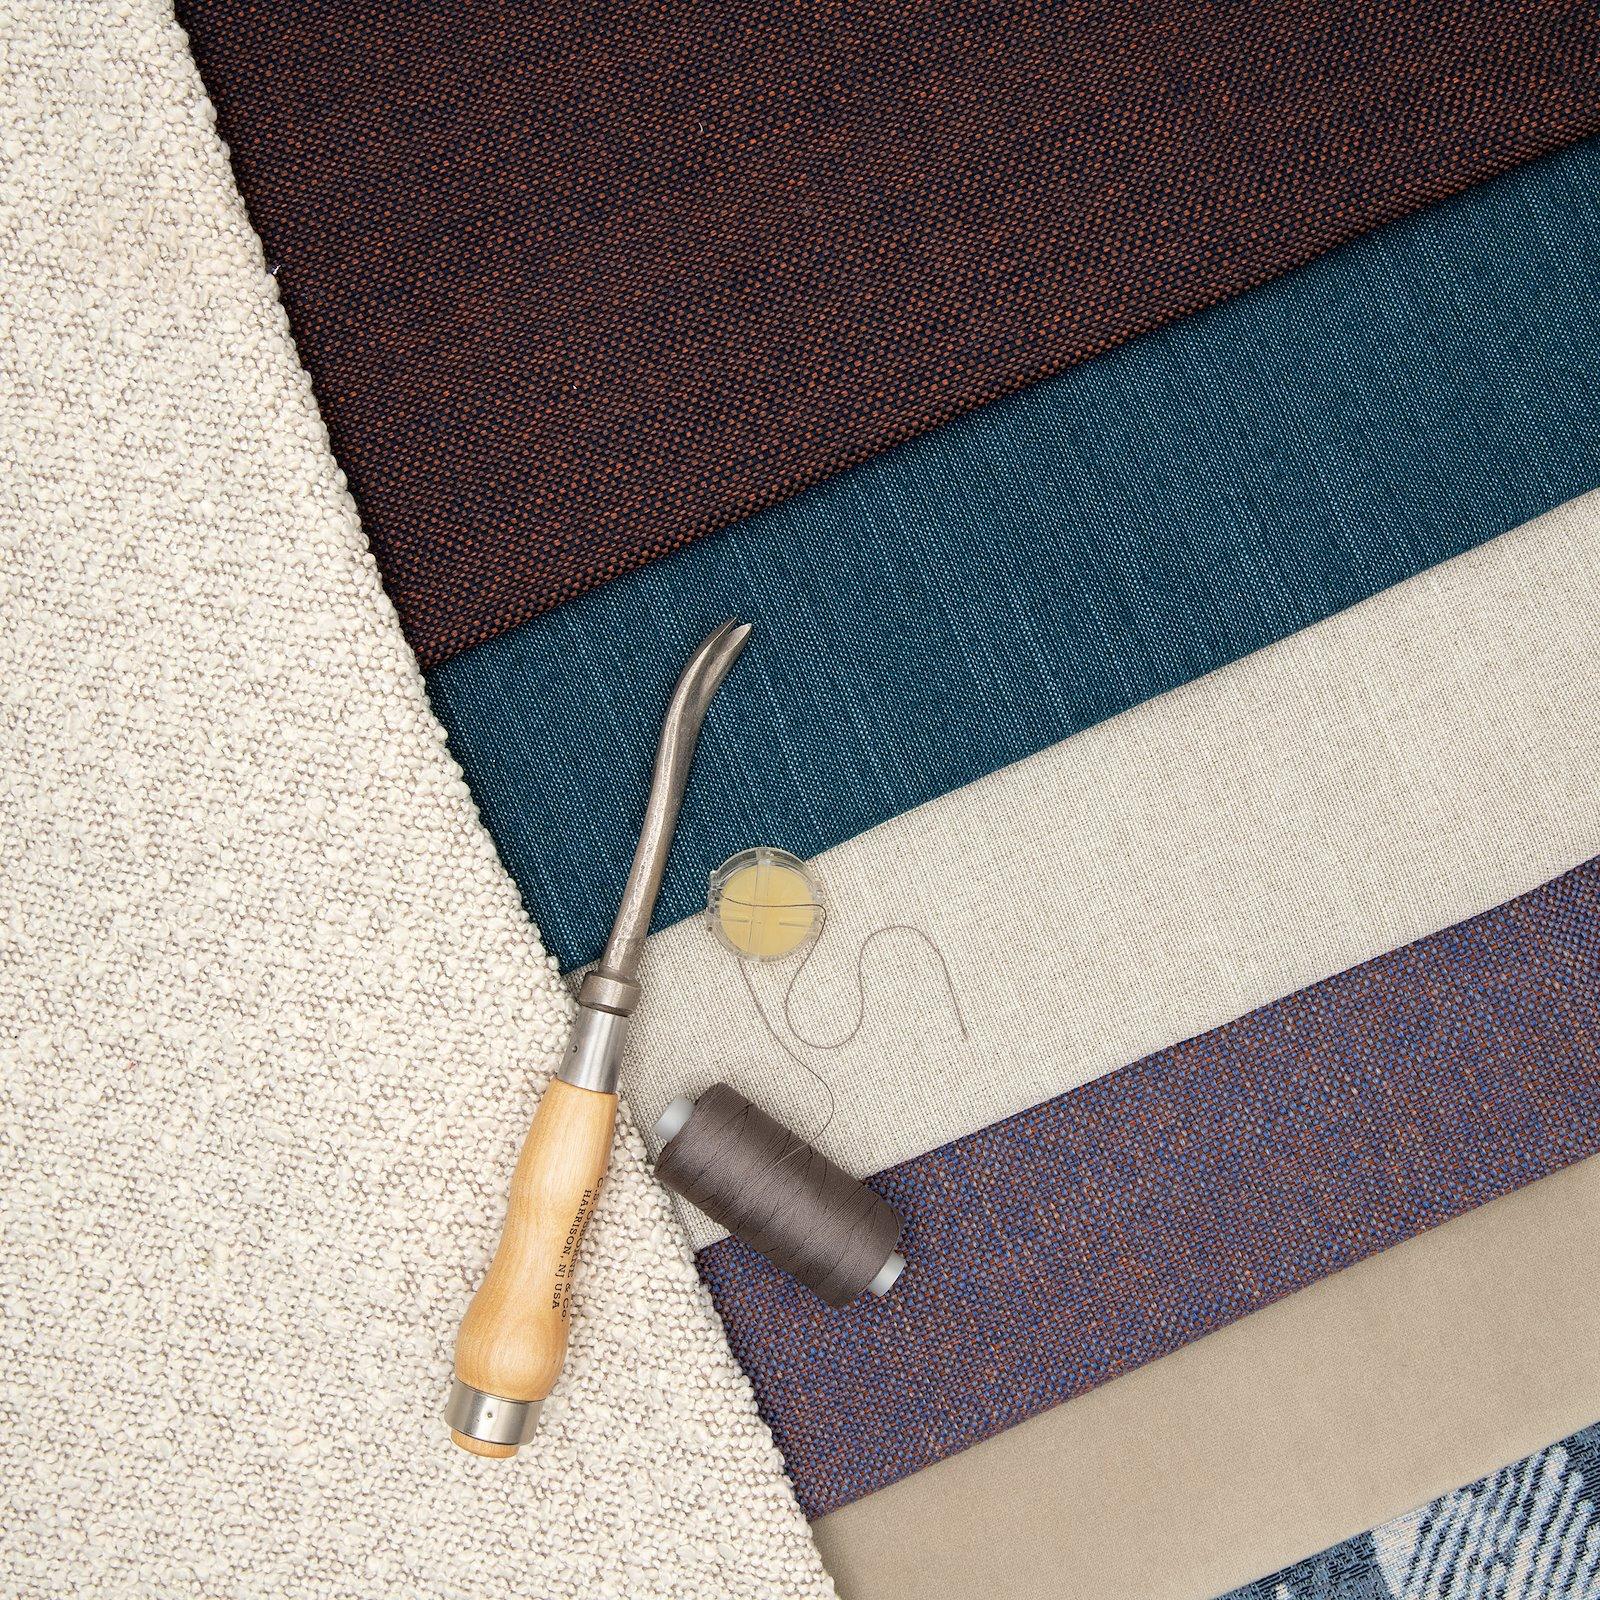 Recycled upholstery fabric putty melange 824161_824157_824153_824152_824156_824158_bundle